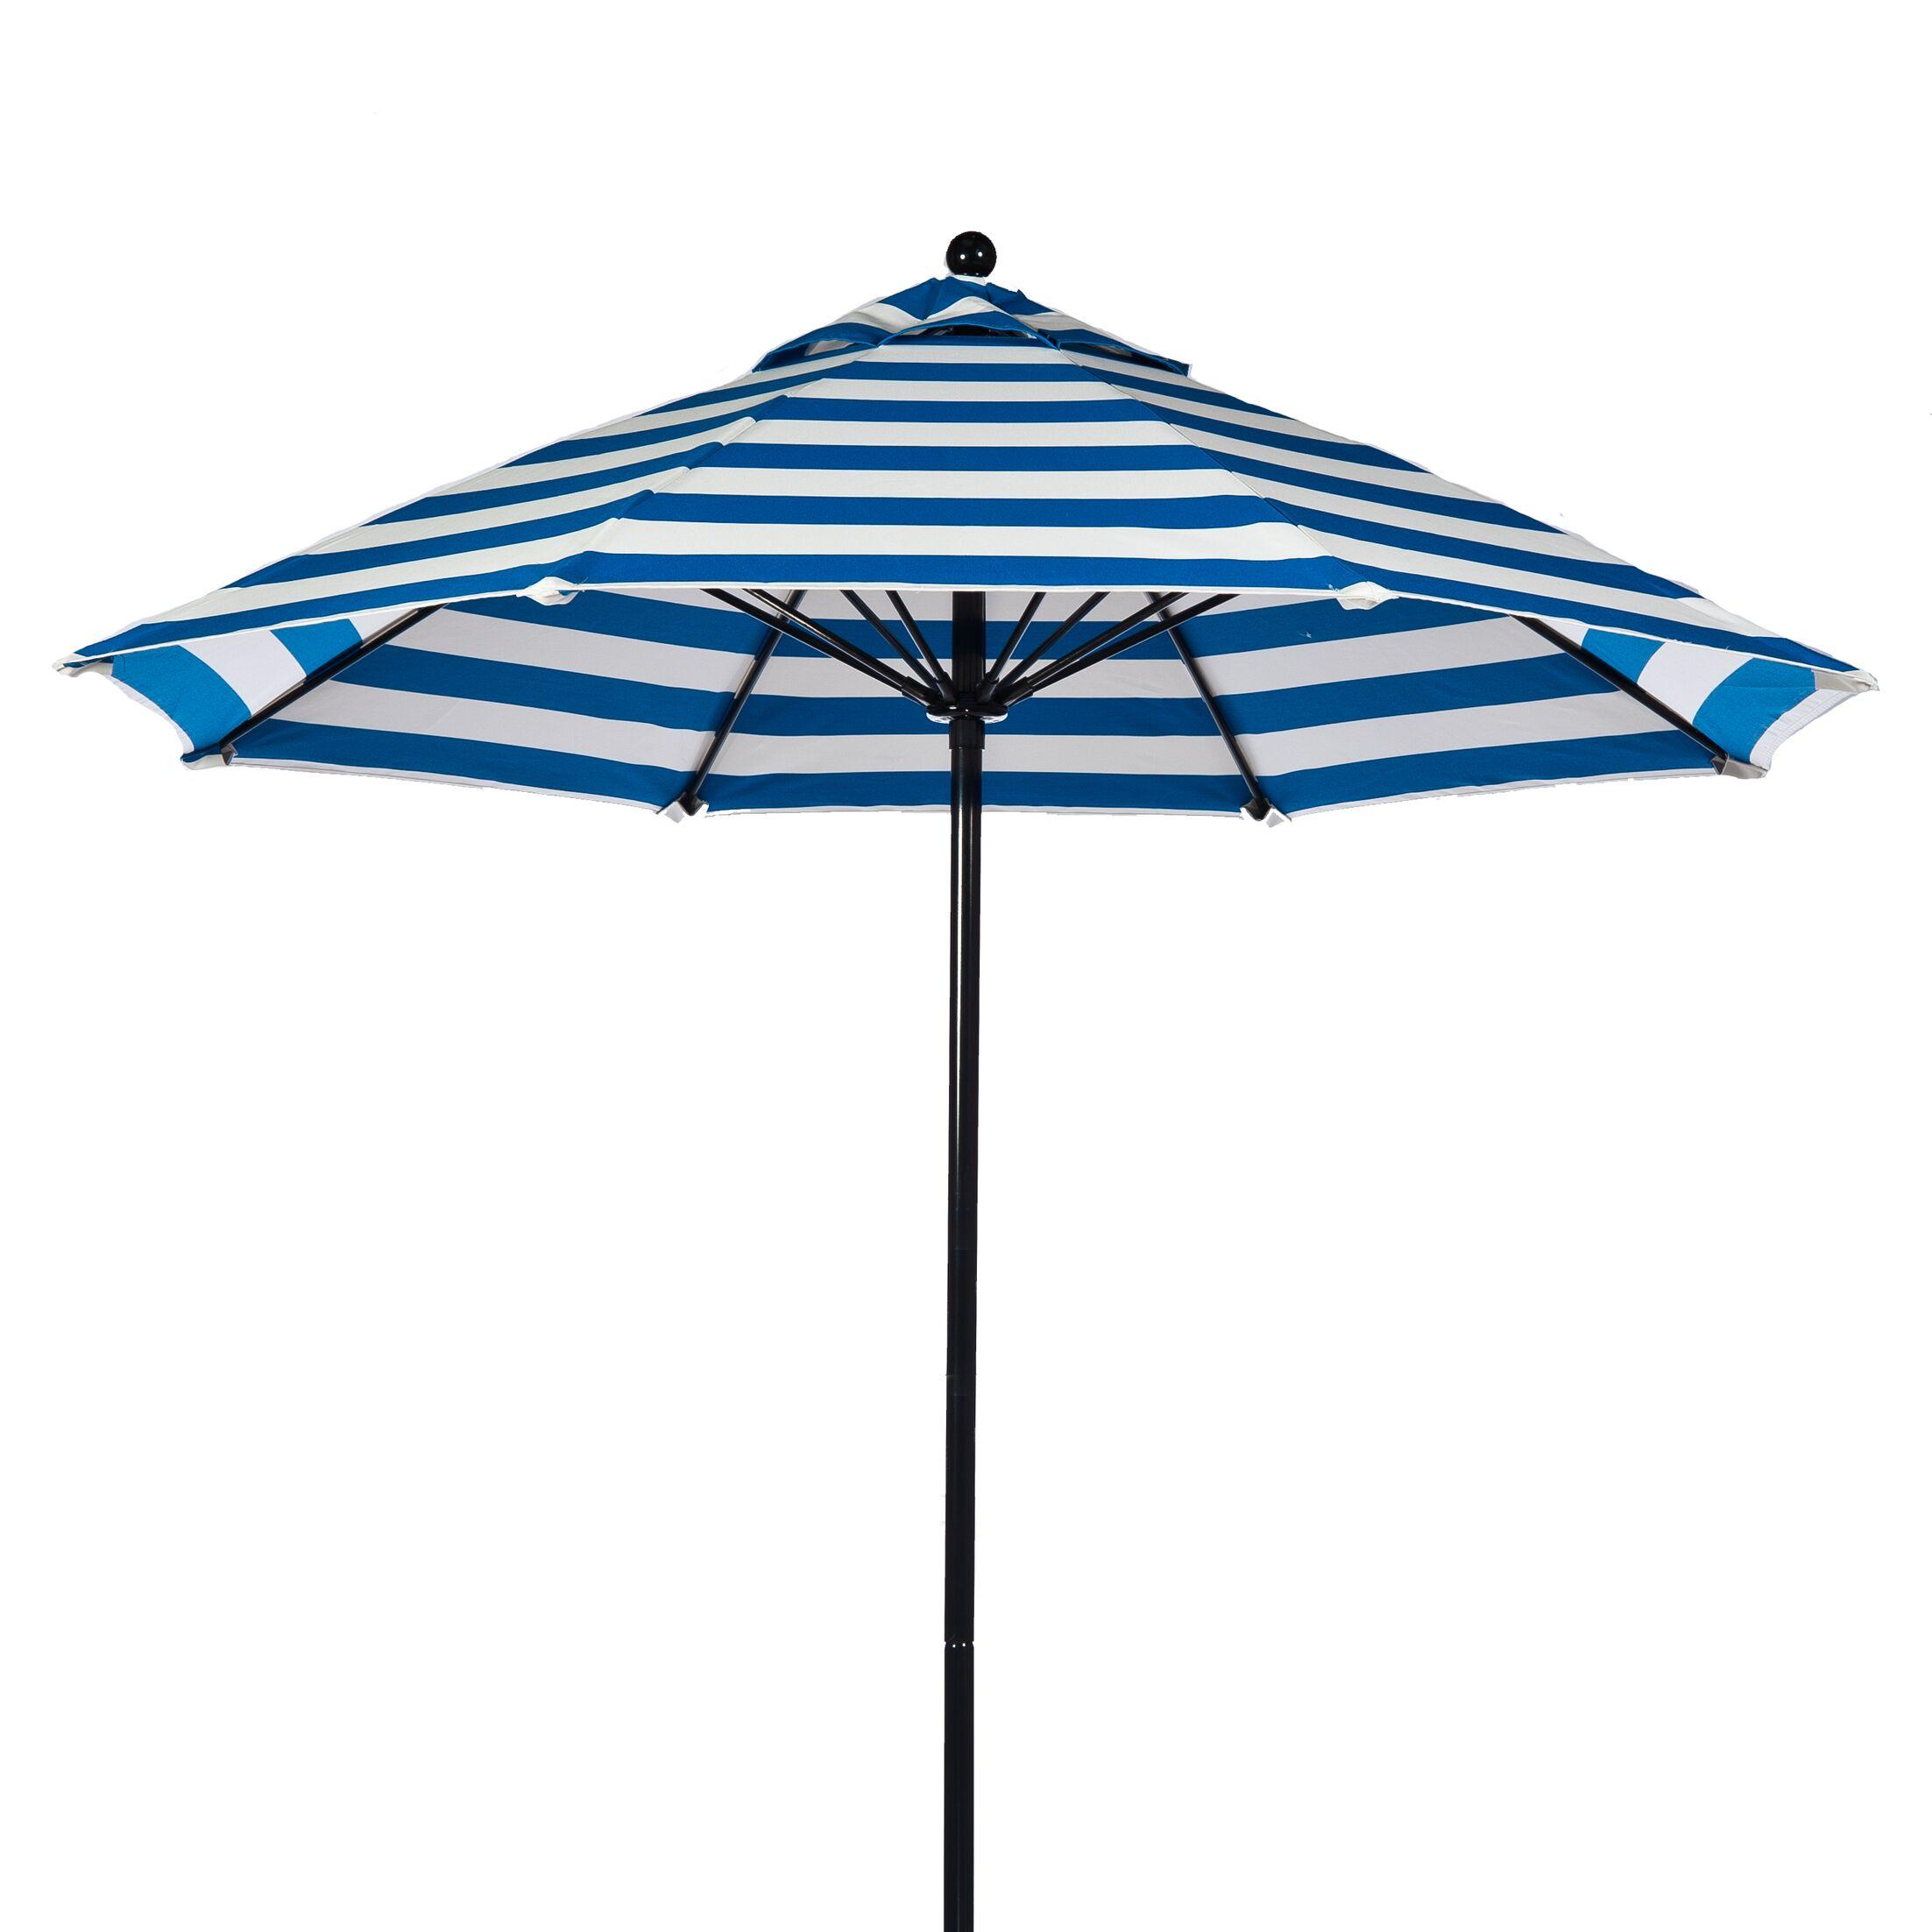 9' Market Umbrella Pole Type: Bronze Coated Aluminum Pole, Fabric: Black and White Stripe